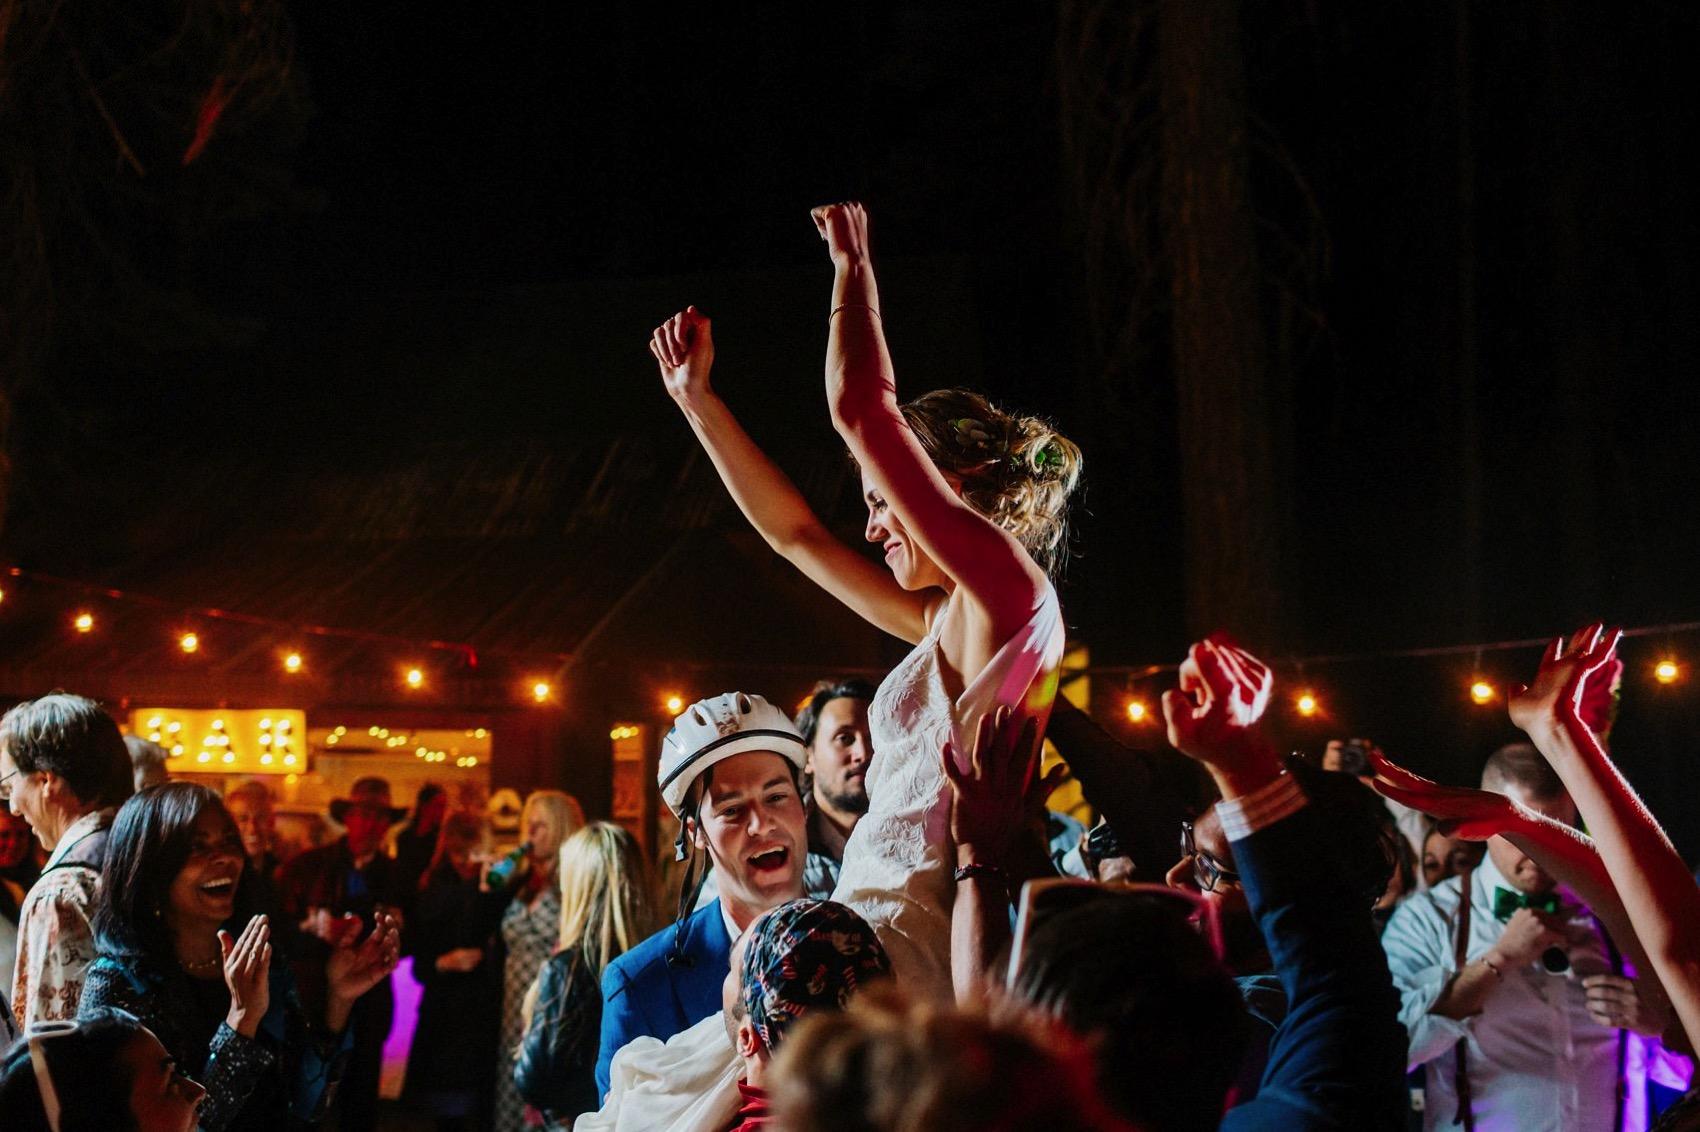 camp-shaffer-wedding-the-goodness-photo-217-photo.jpg